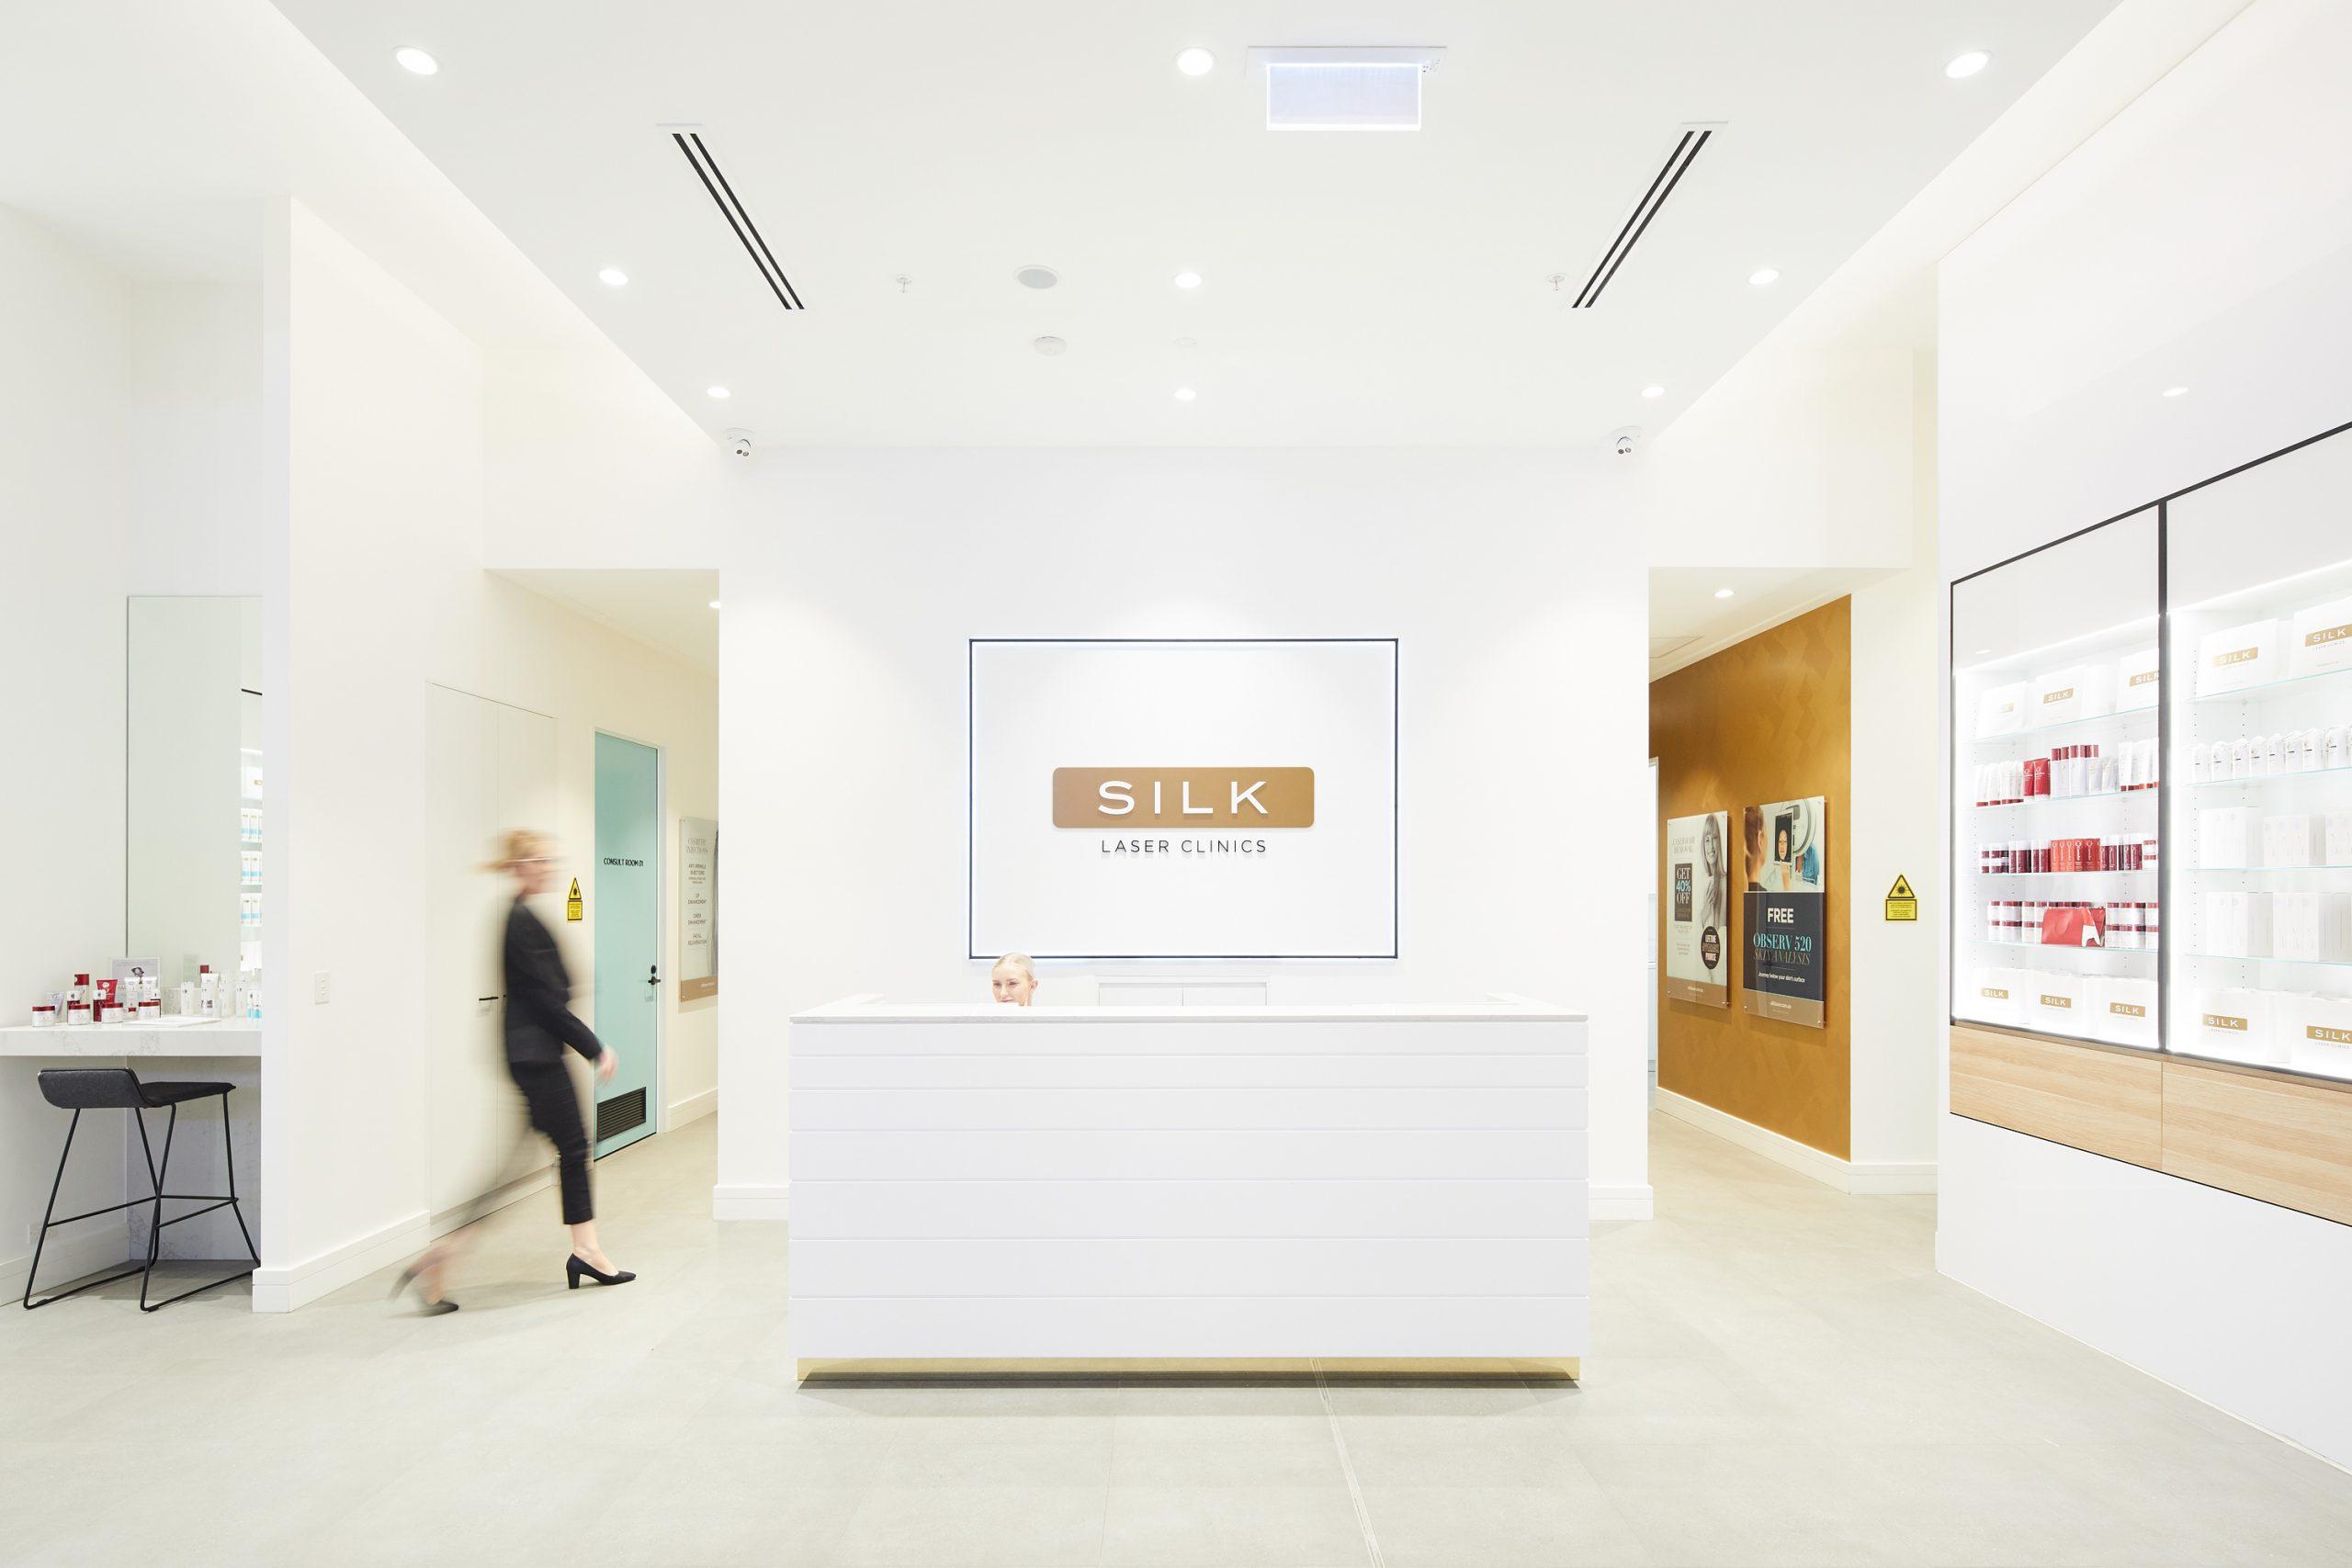 SILK Laser Clinics